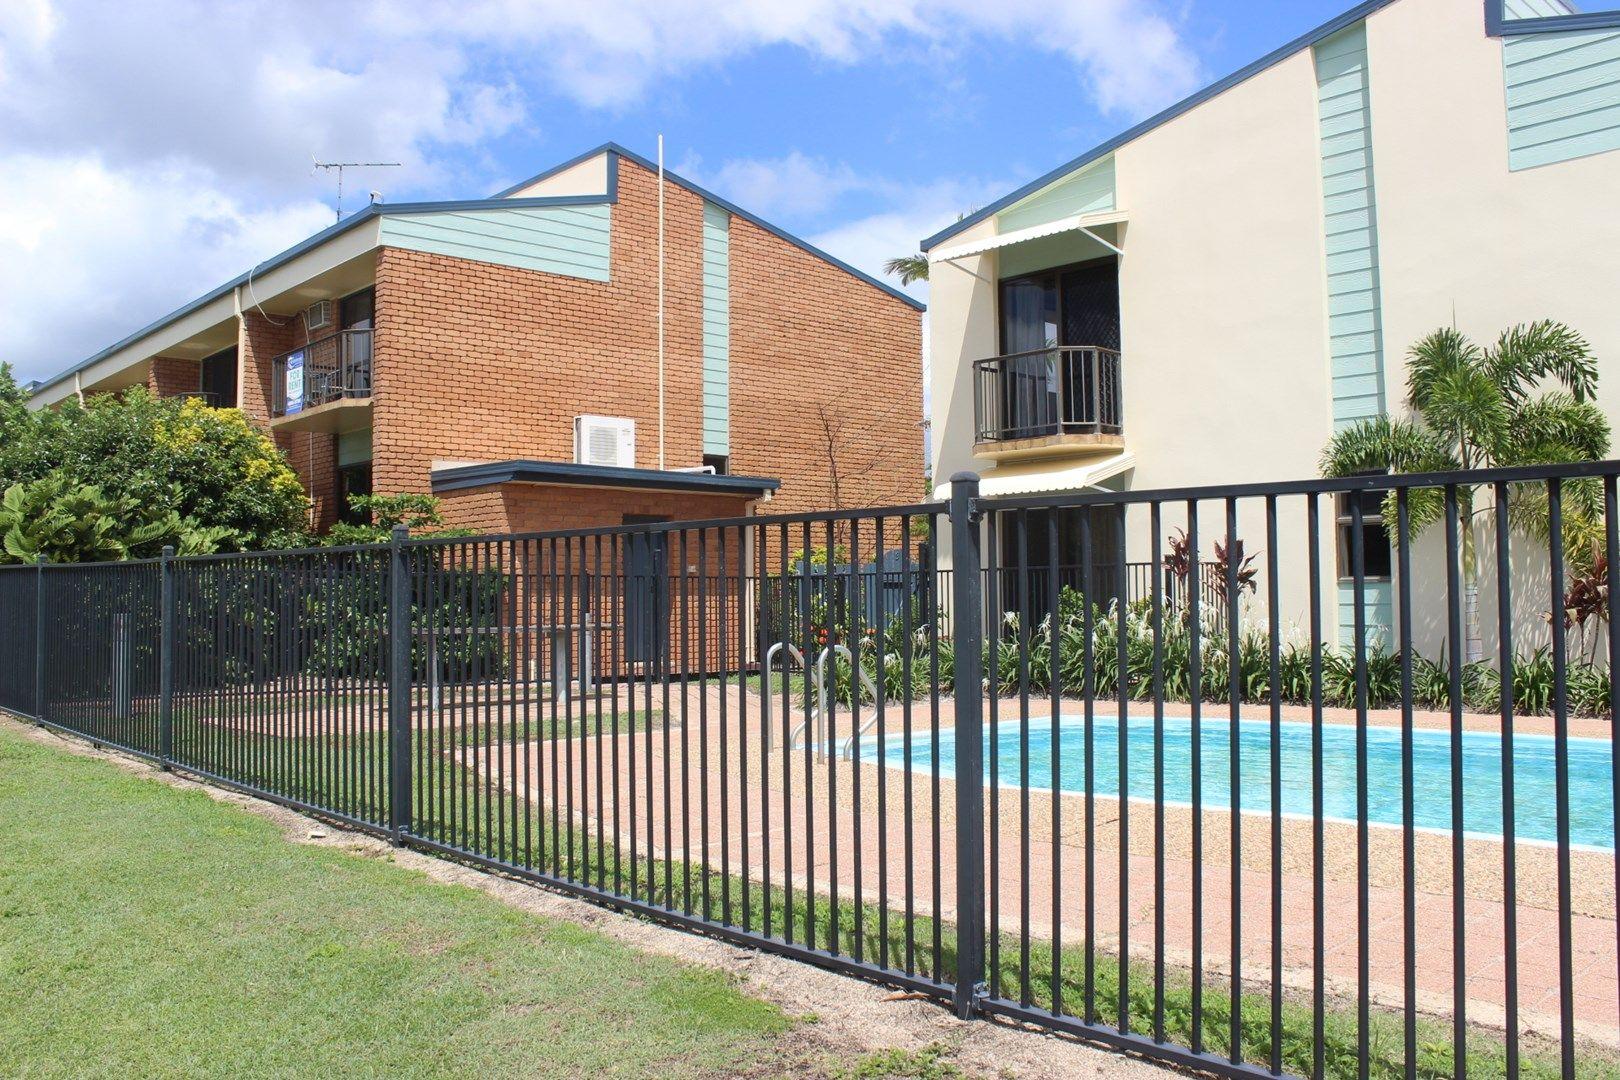 11/160 Victoria Street, Cardwell QLD 4849, Image 0